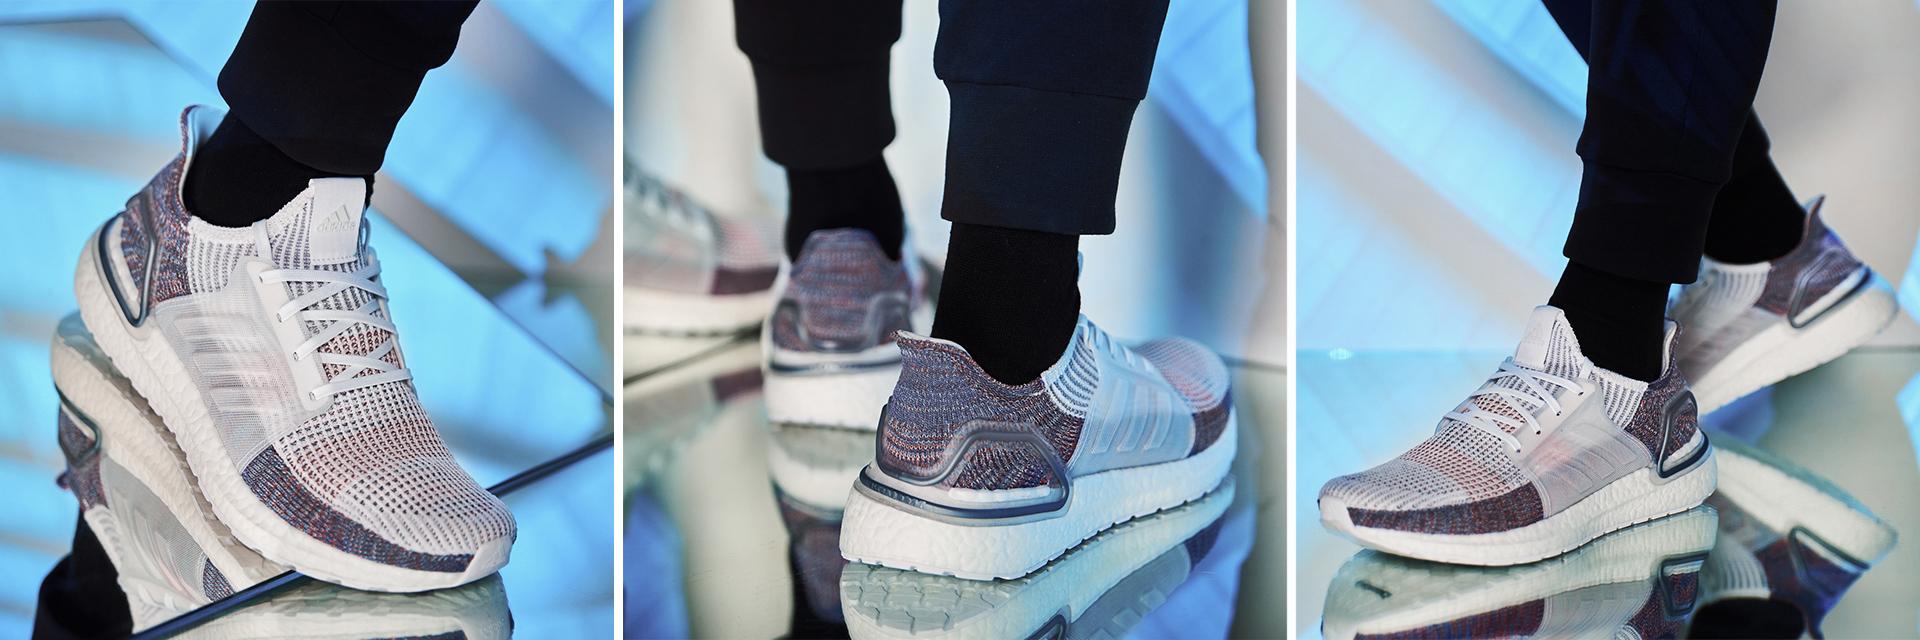 adidas 傳奇跑鞋「究極進化版」腳感狂升級!手刀奉上 UltraBOOST 19 全新配色「Refract 炫彩白」發售訊息